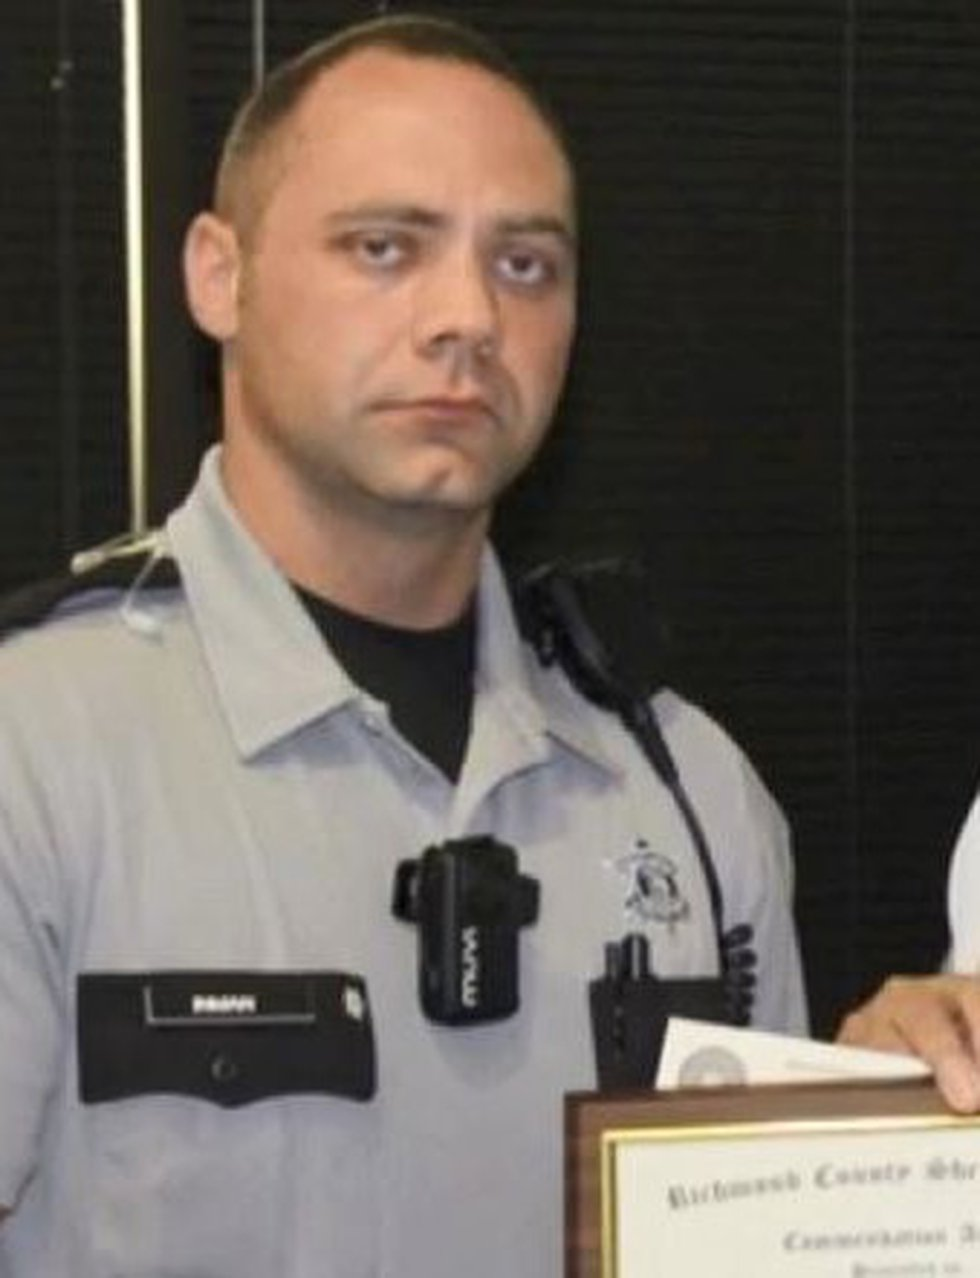 Richmond County Deputy Keith Inman